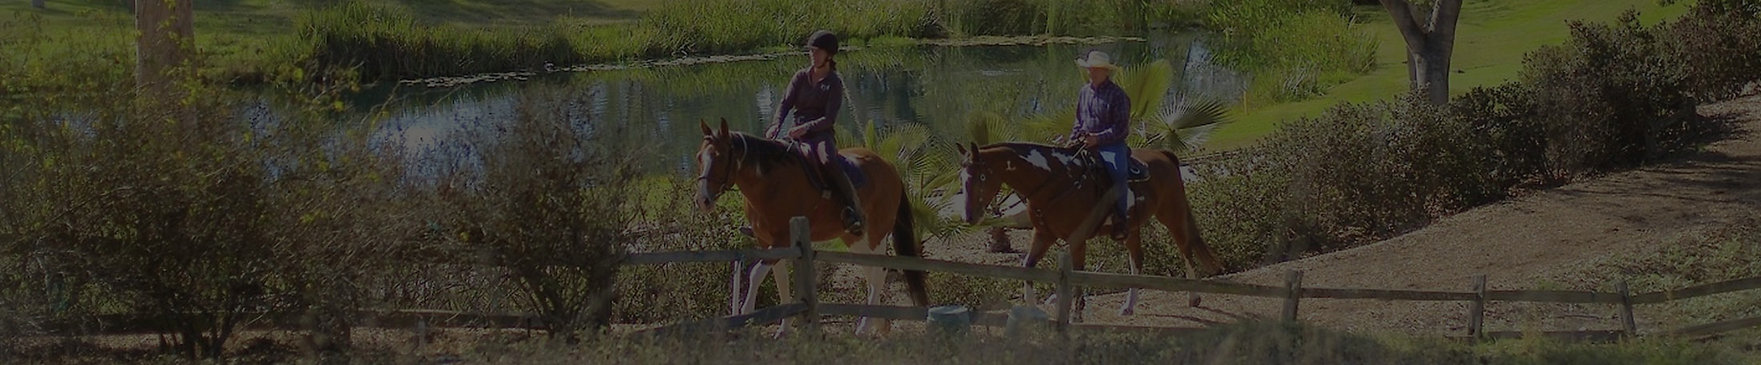 Rancho-Santa-Fe_Horses_001_edited.jpg